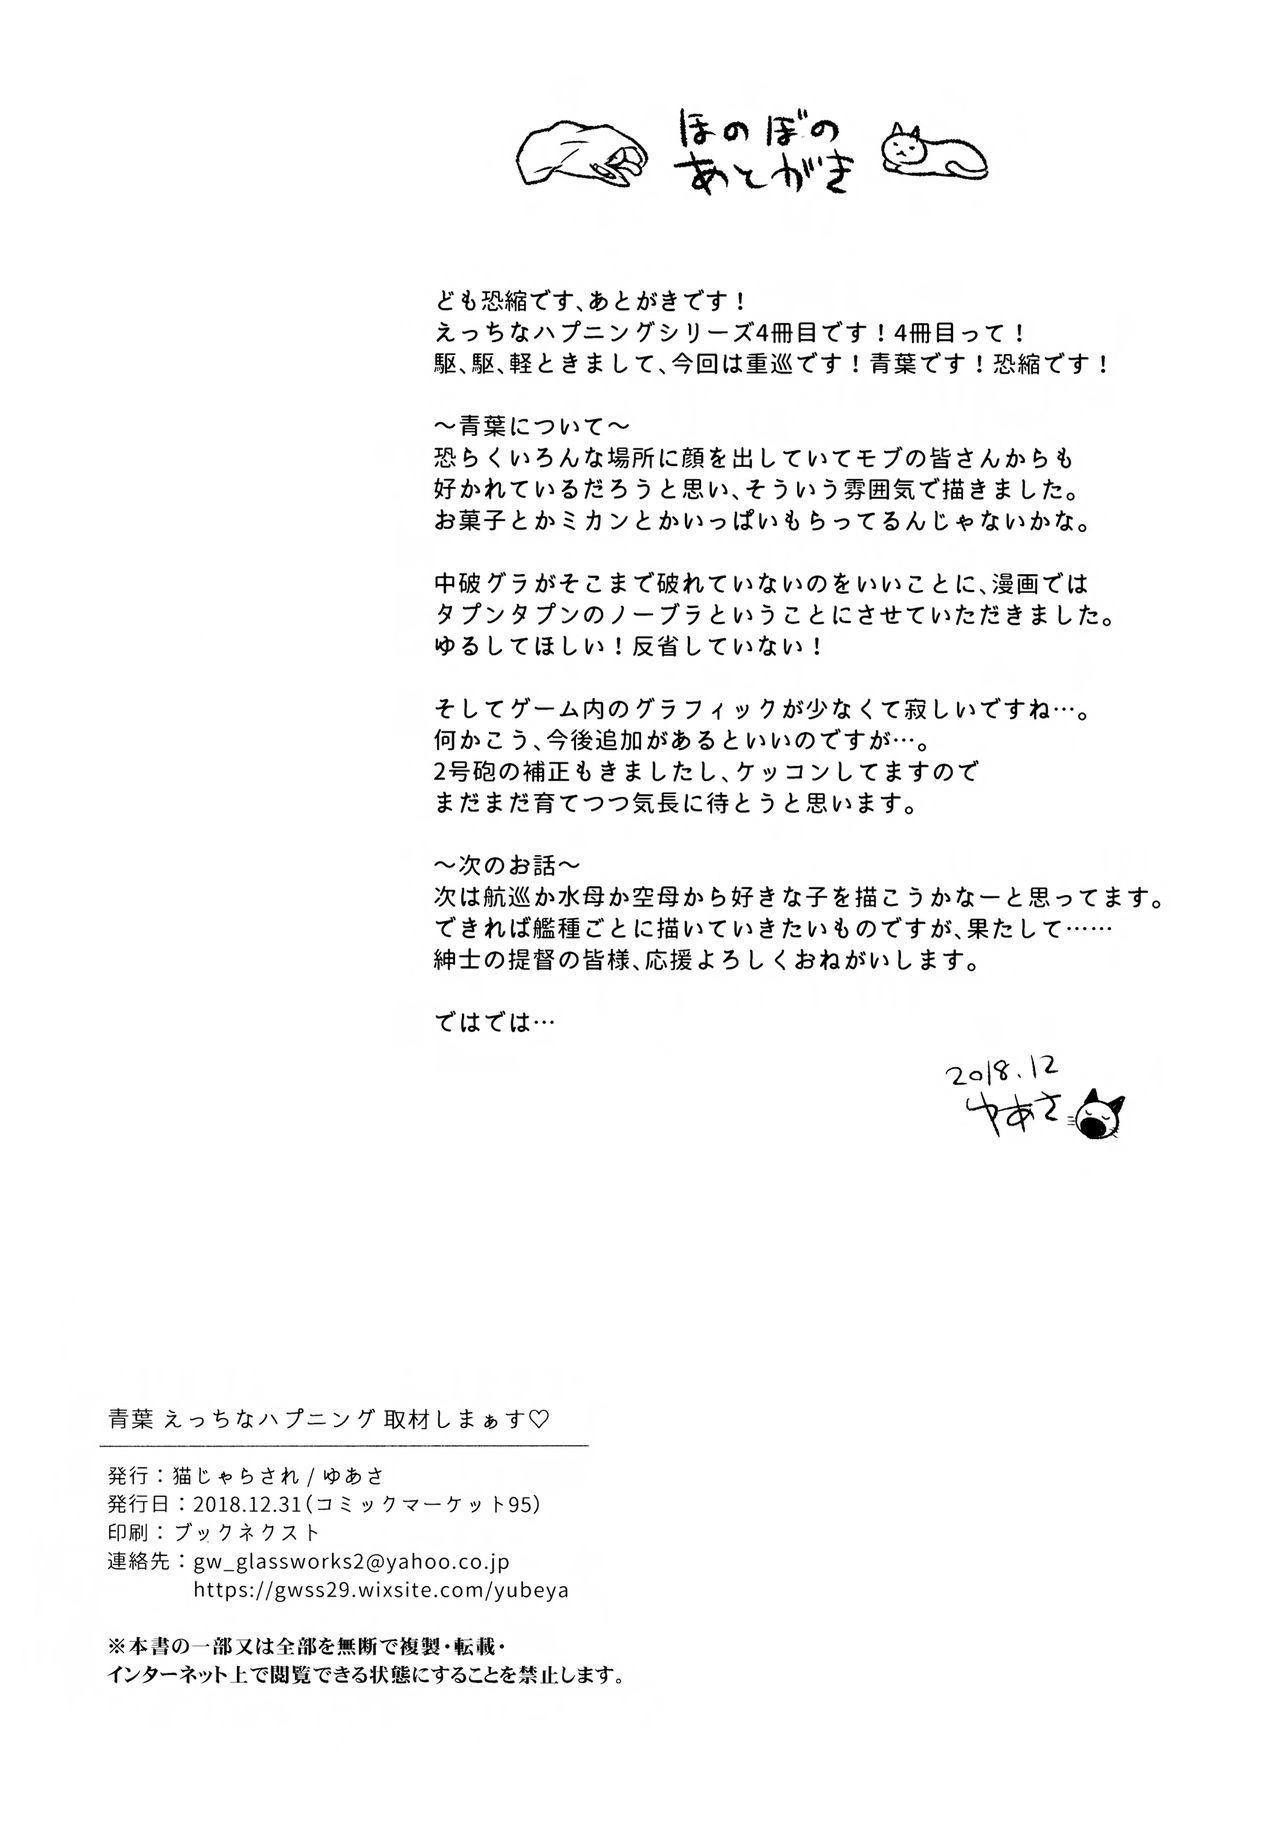 Aoba Ecchi na Happening Shuzai Shimaasu 24